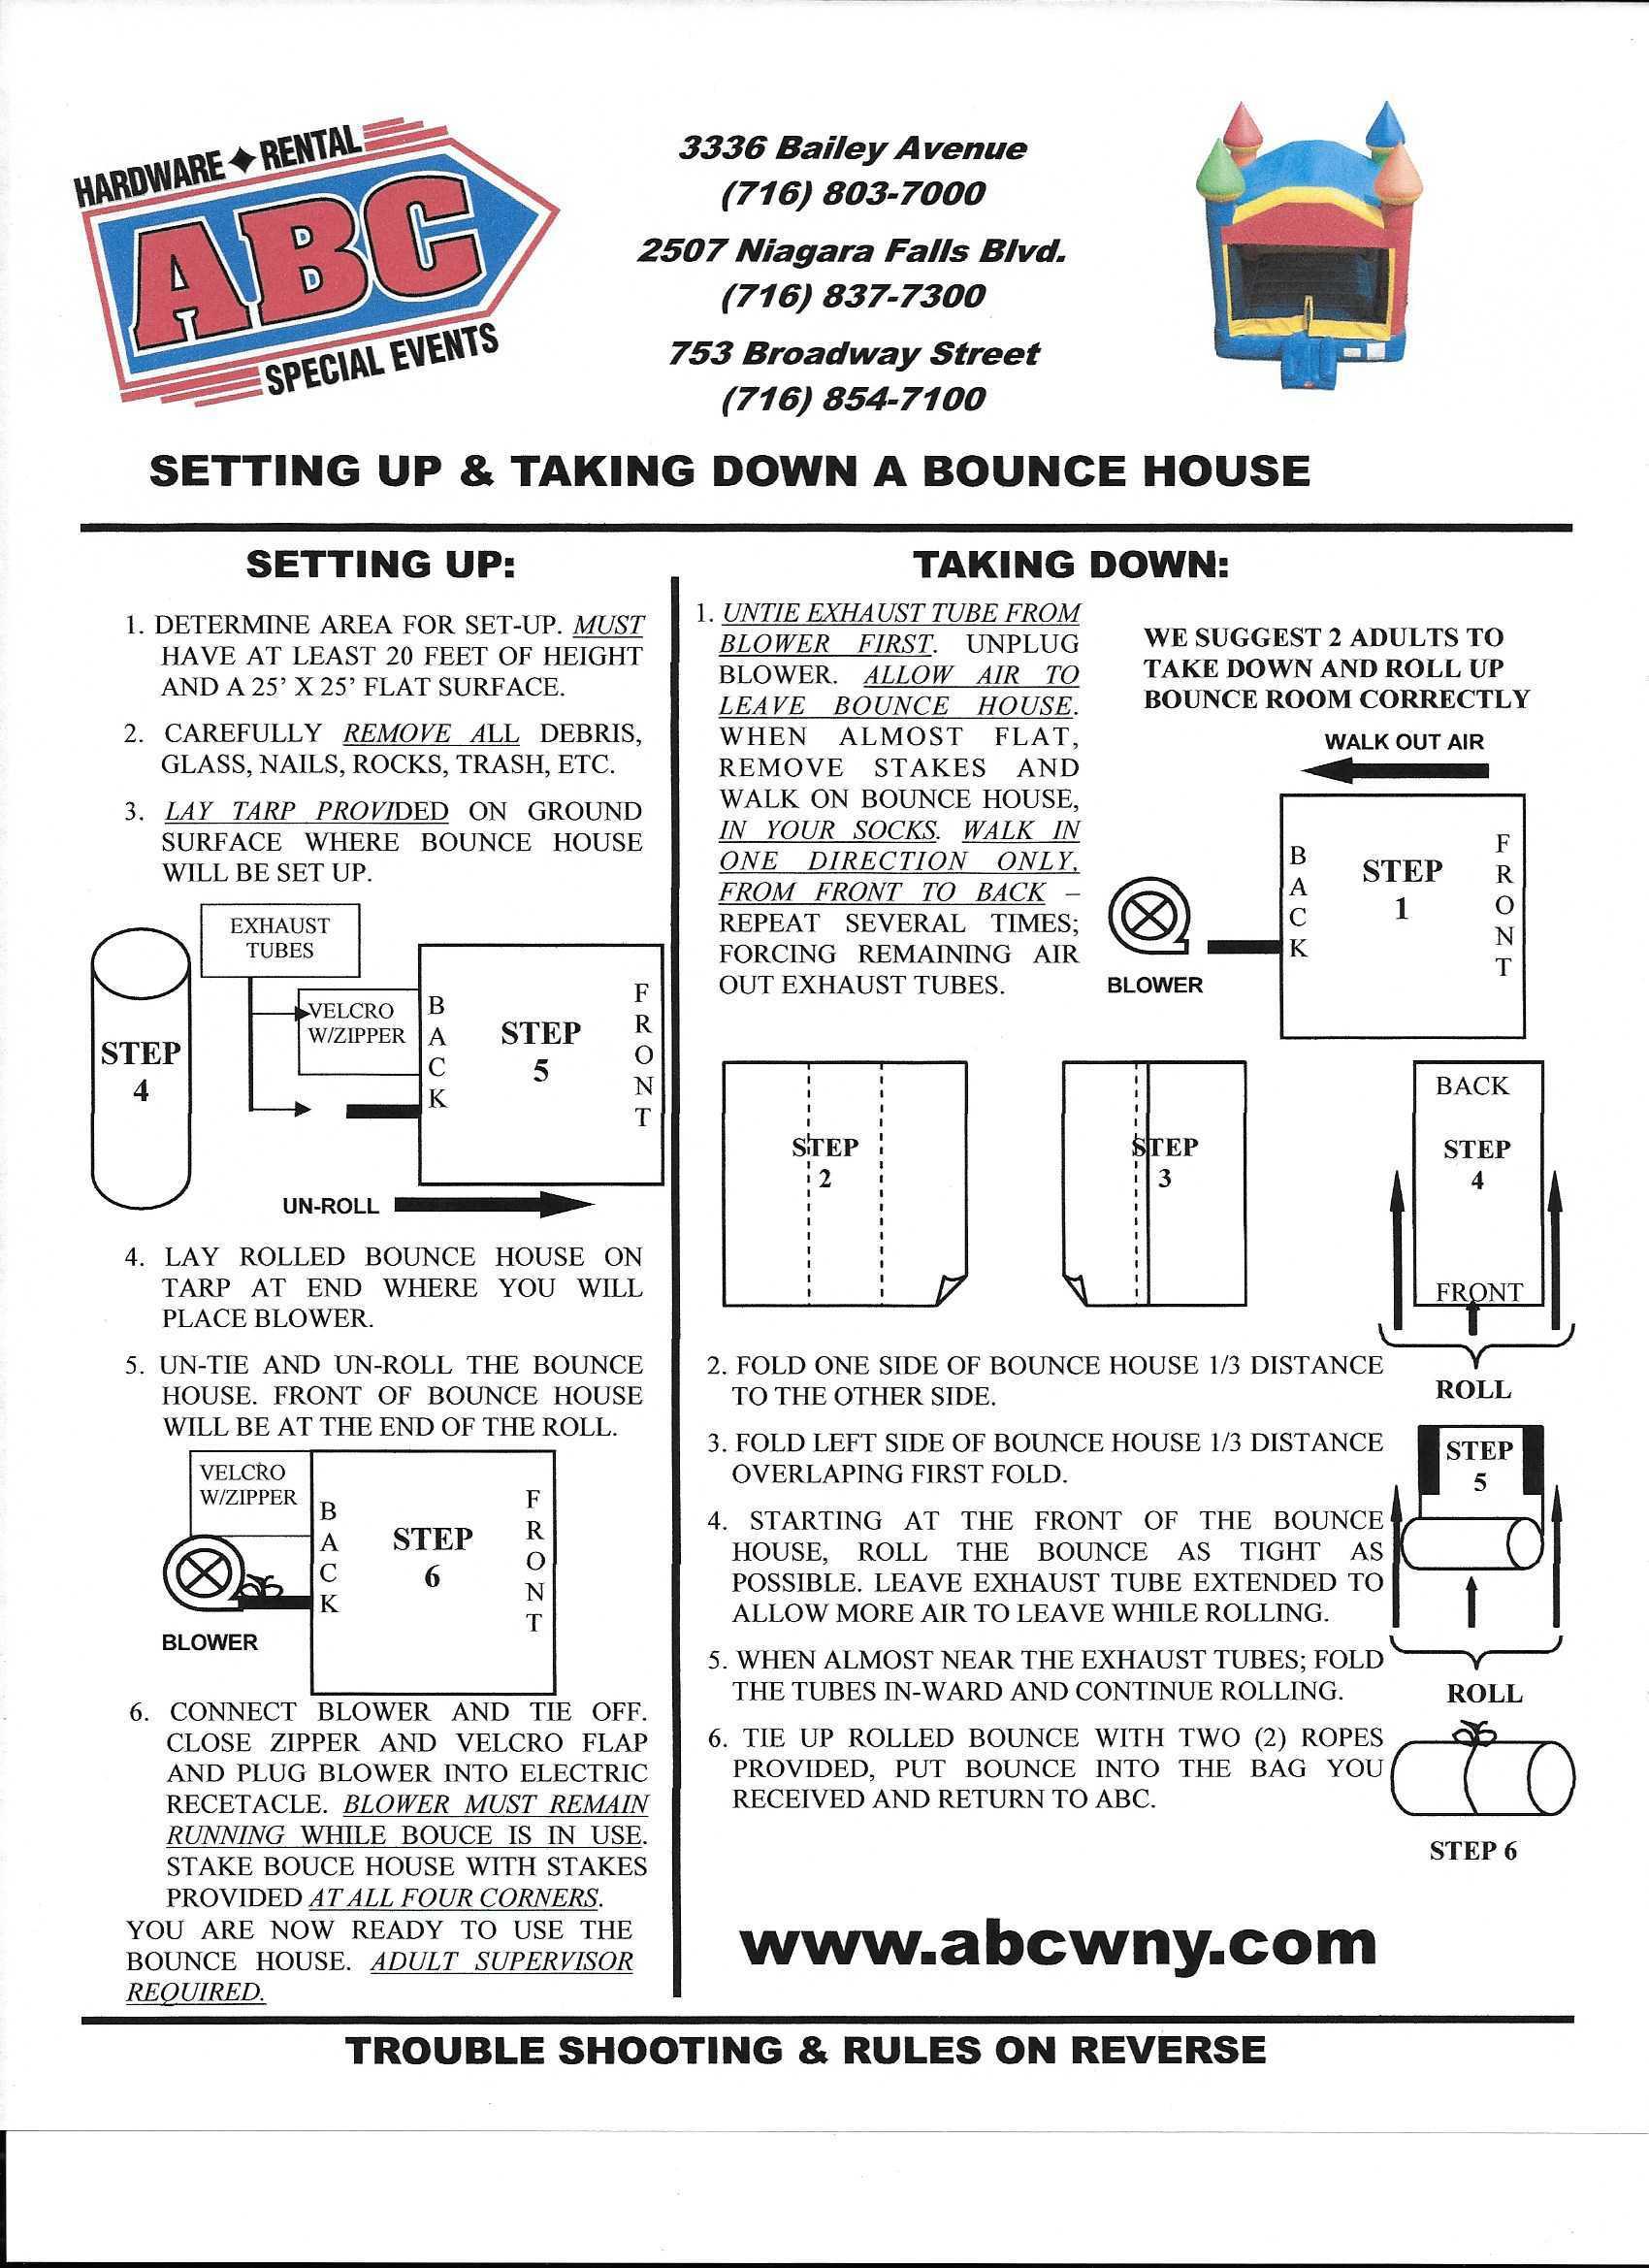 bounce-house-instructions0001.jpg